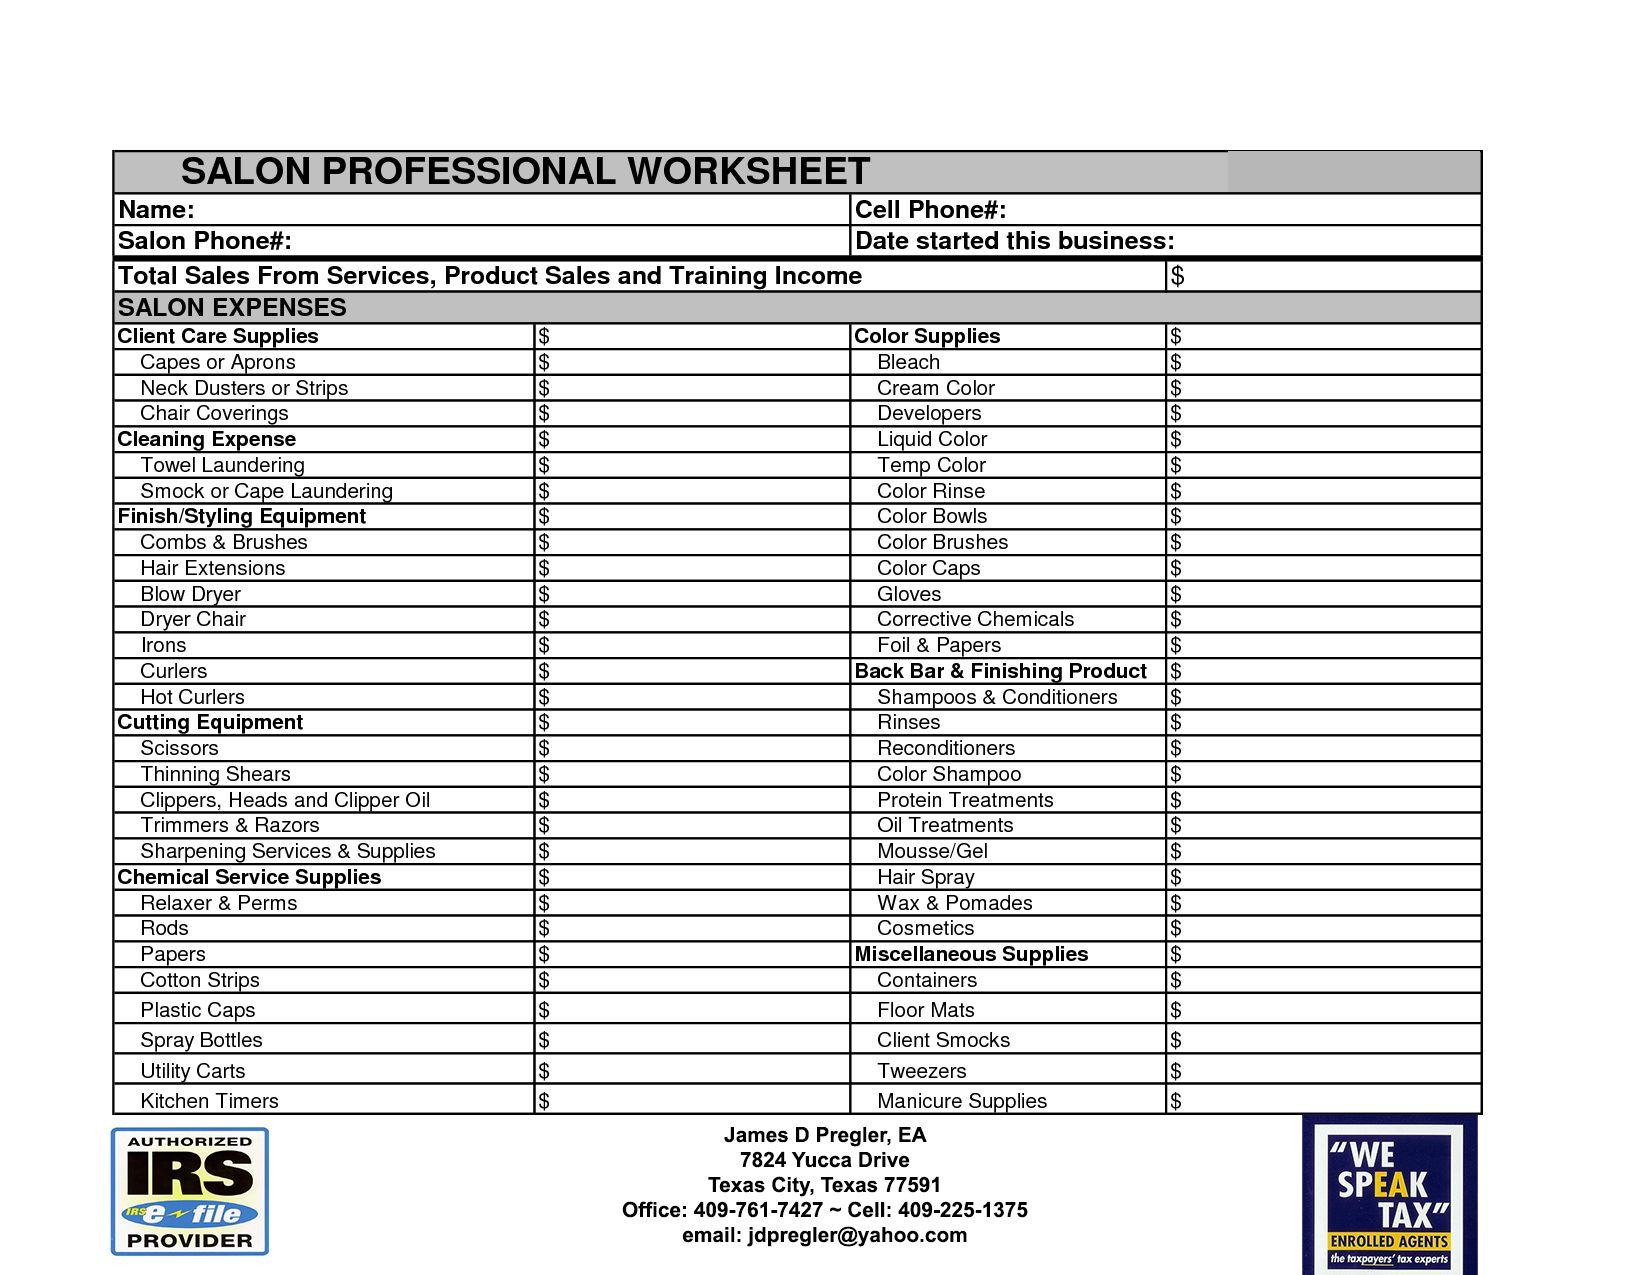 Worksheet Home Office Deduction